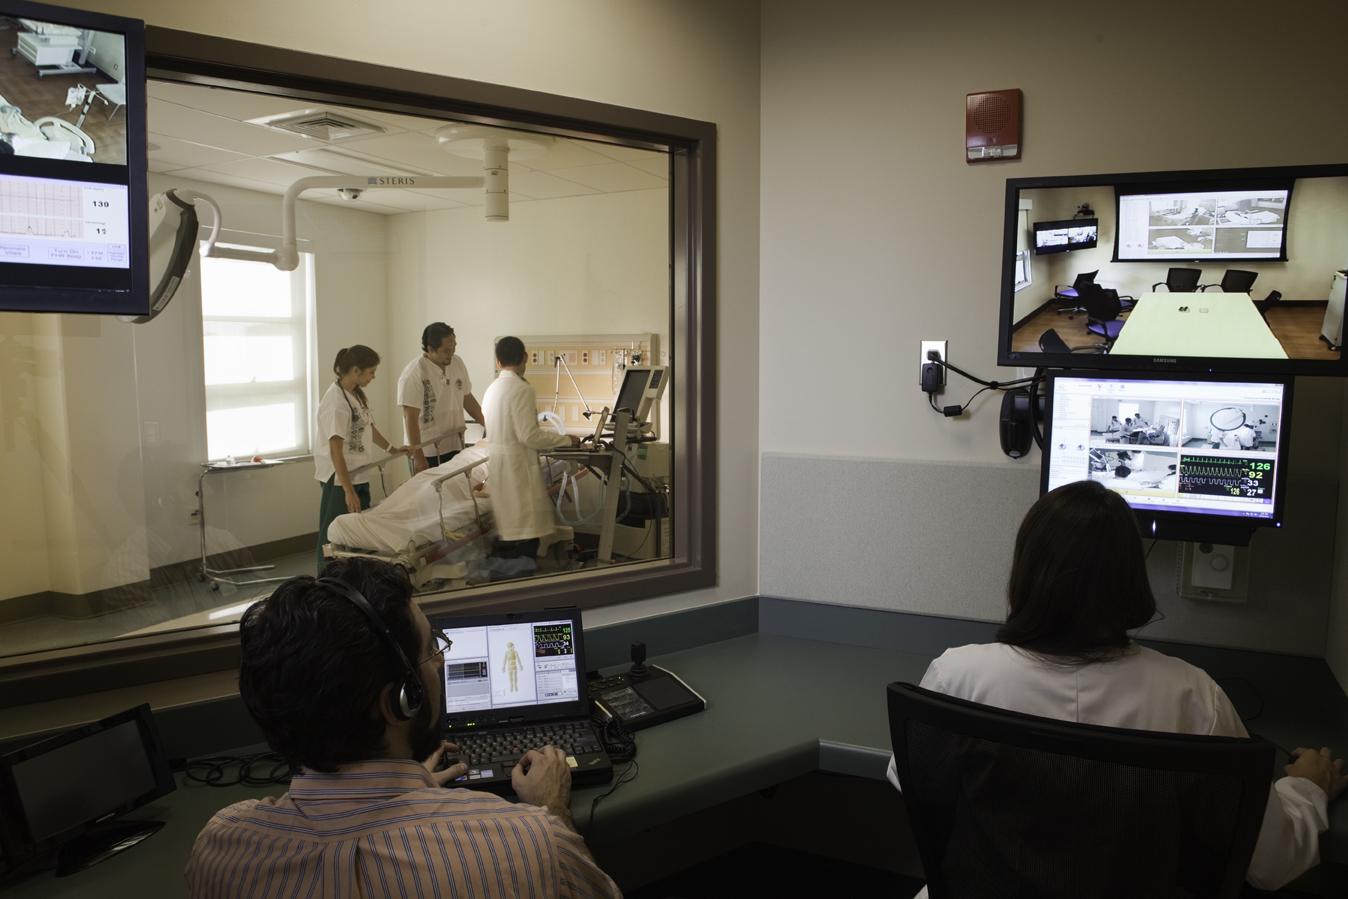 inside the simulation center